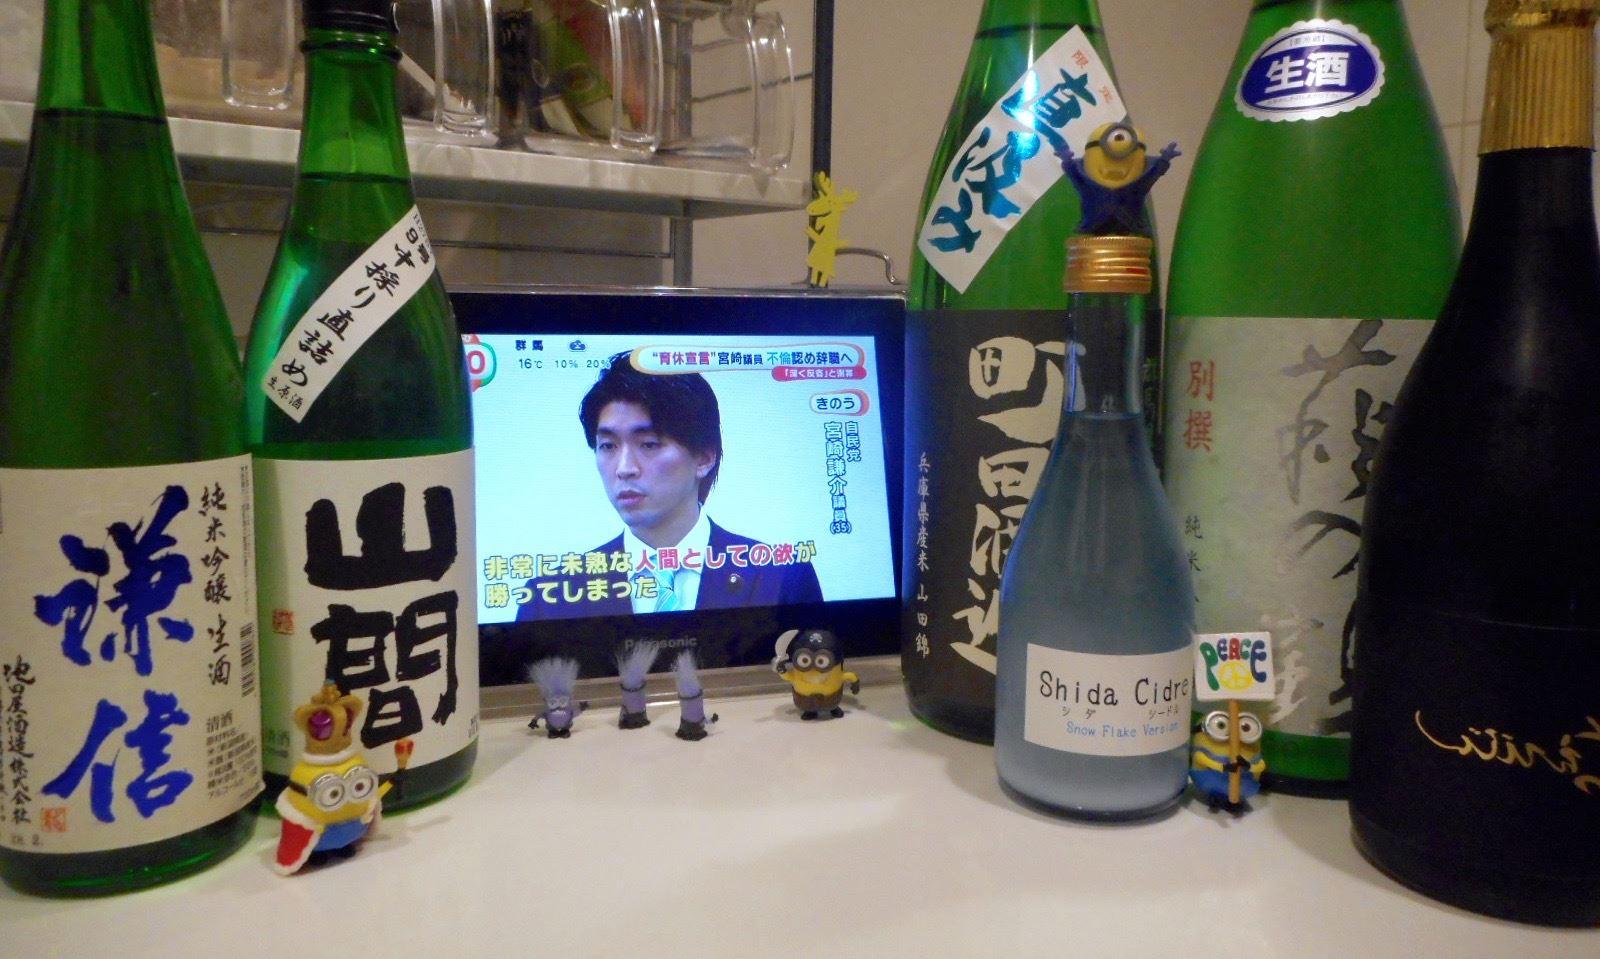 yanma_machida_kenshin.jpg